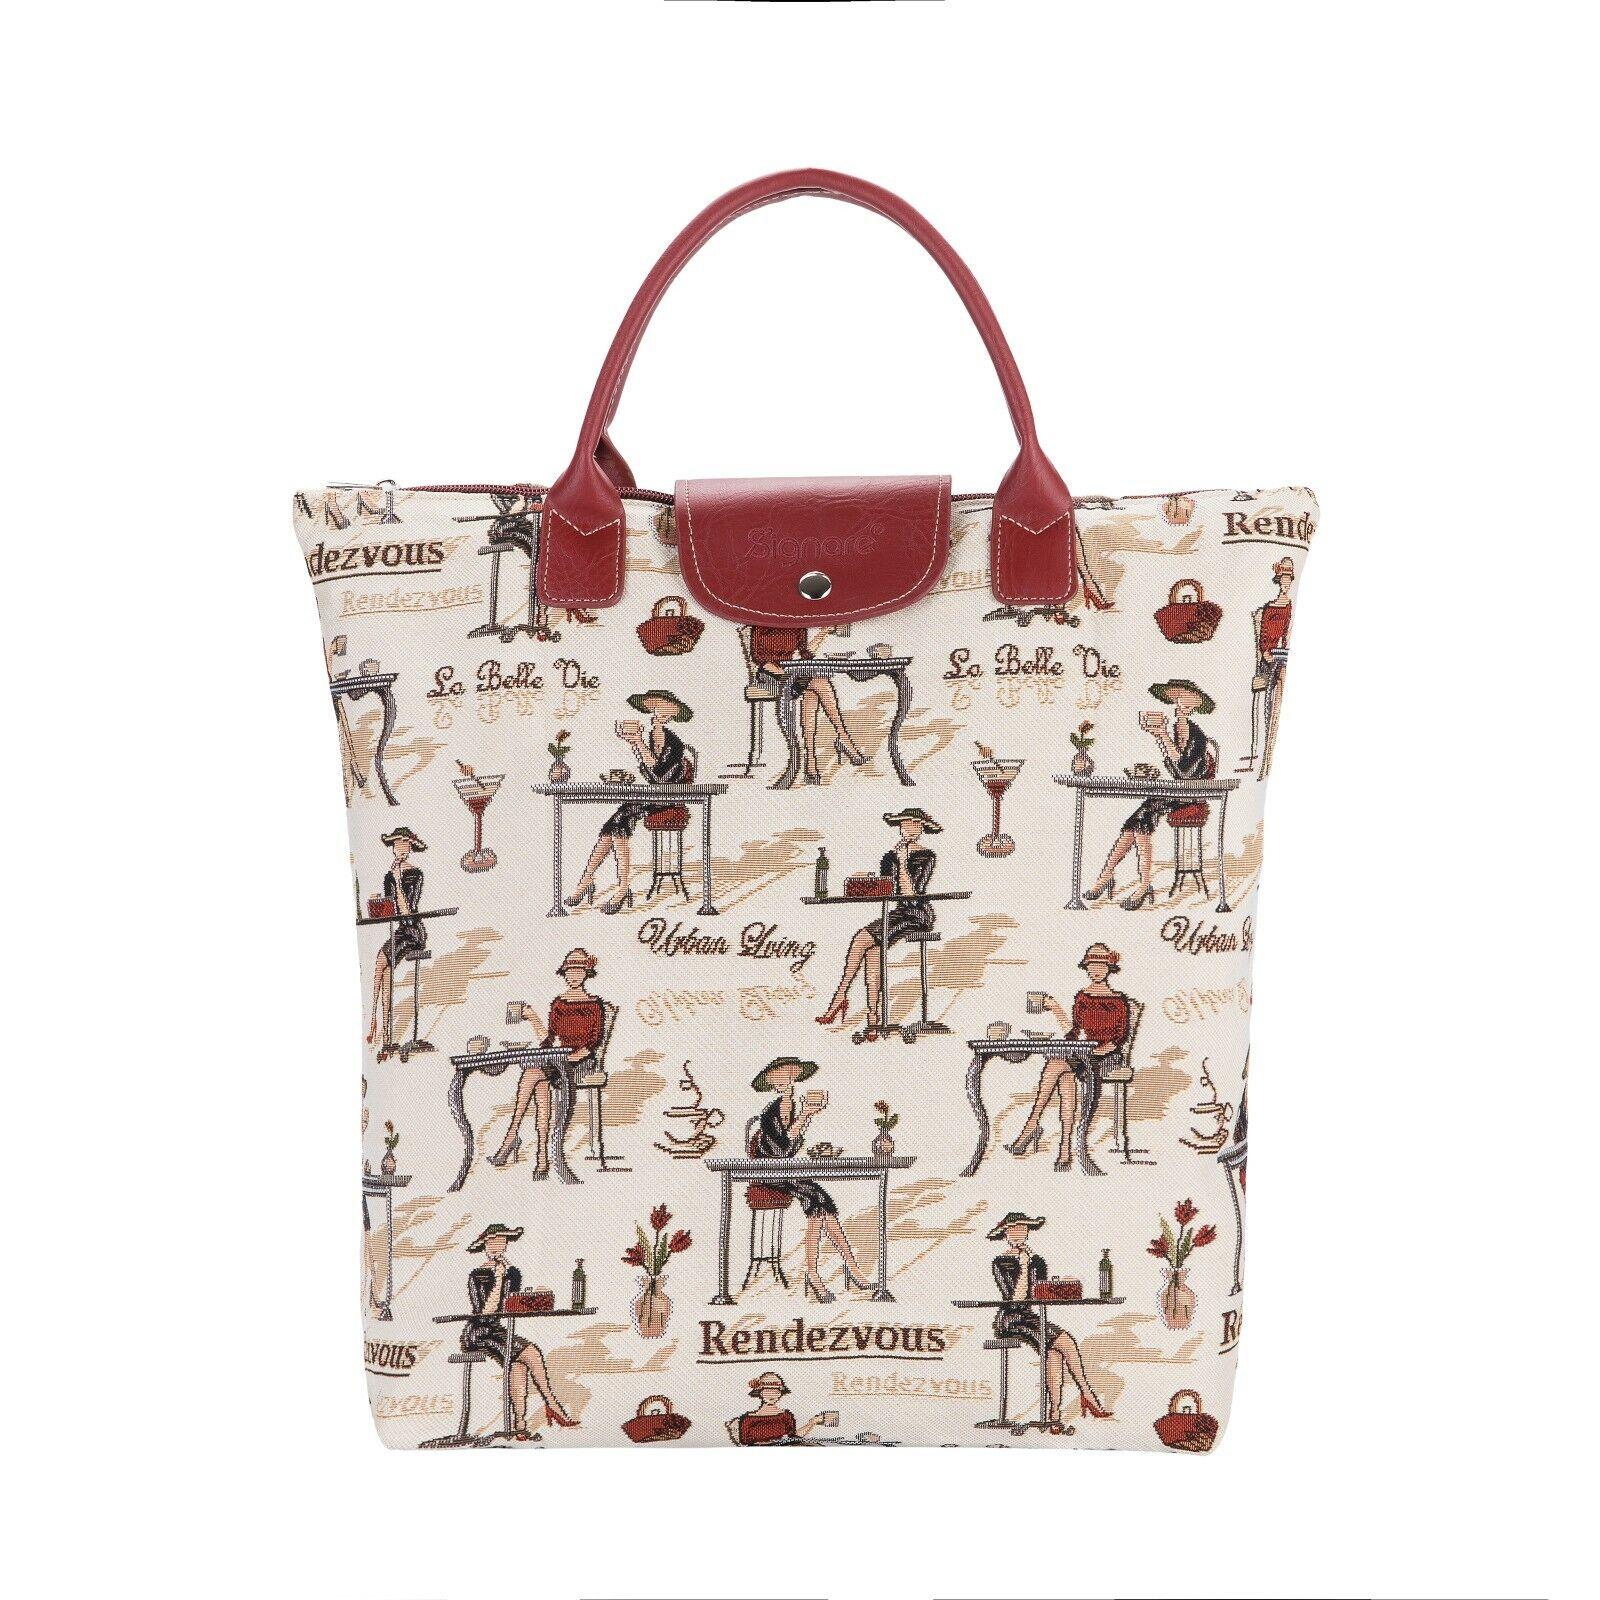 RENDEZVOUS FOLDAWAY SHOPPING BAG BEIGE FOLDABLE TAPESTRY TOTE WOMEN LADIES GIFT